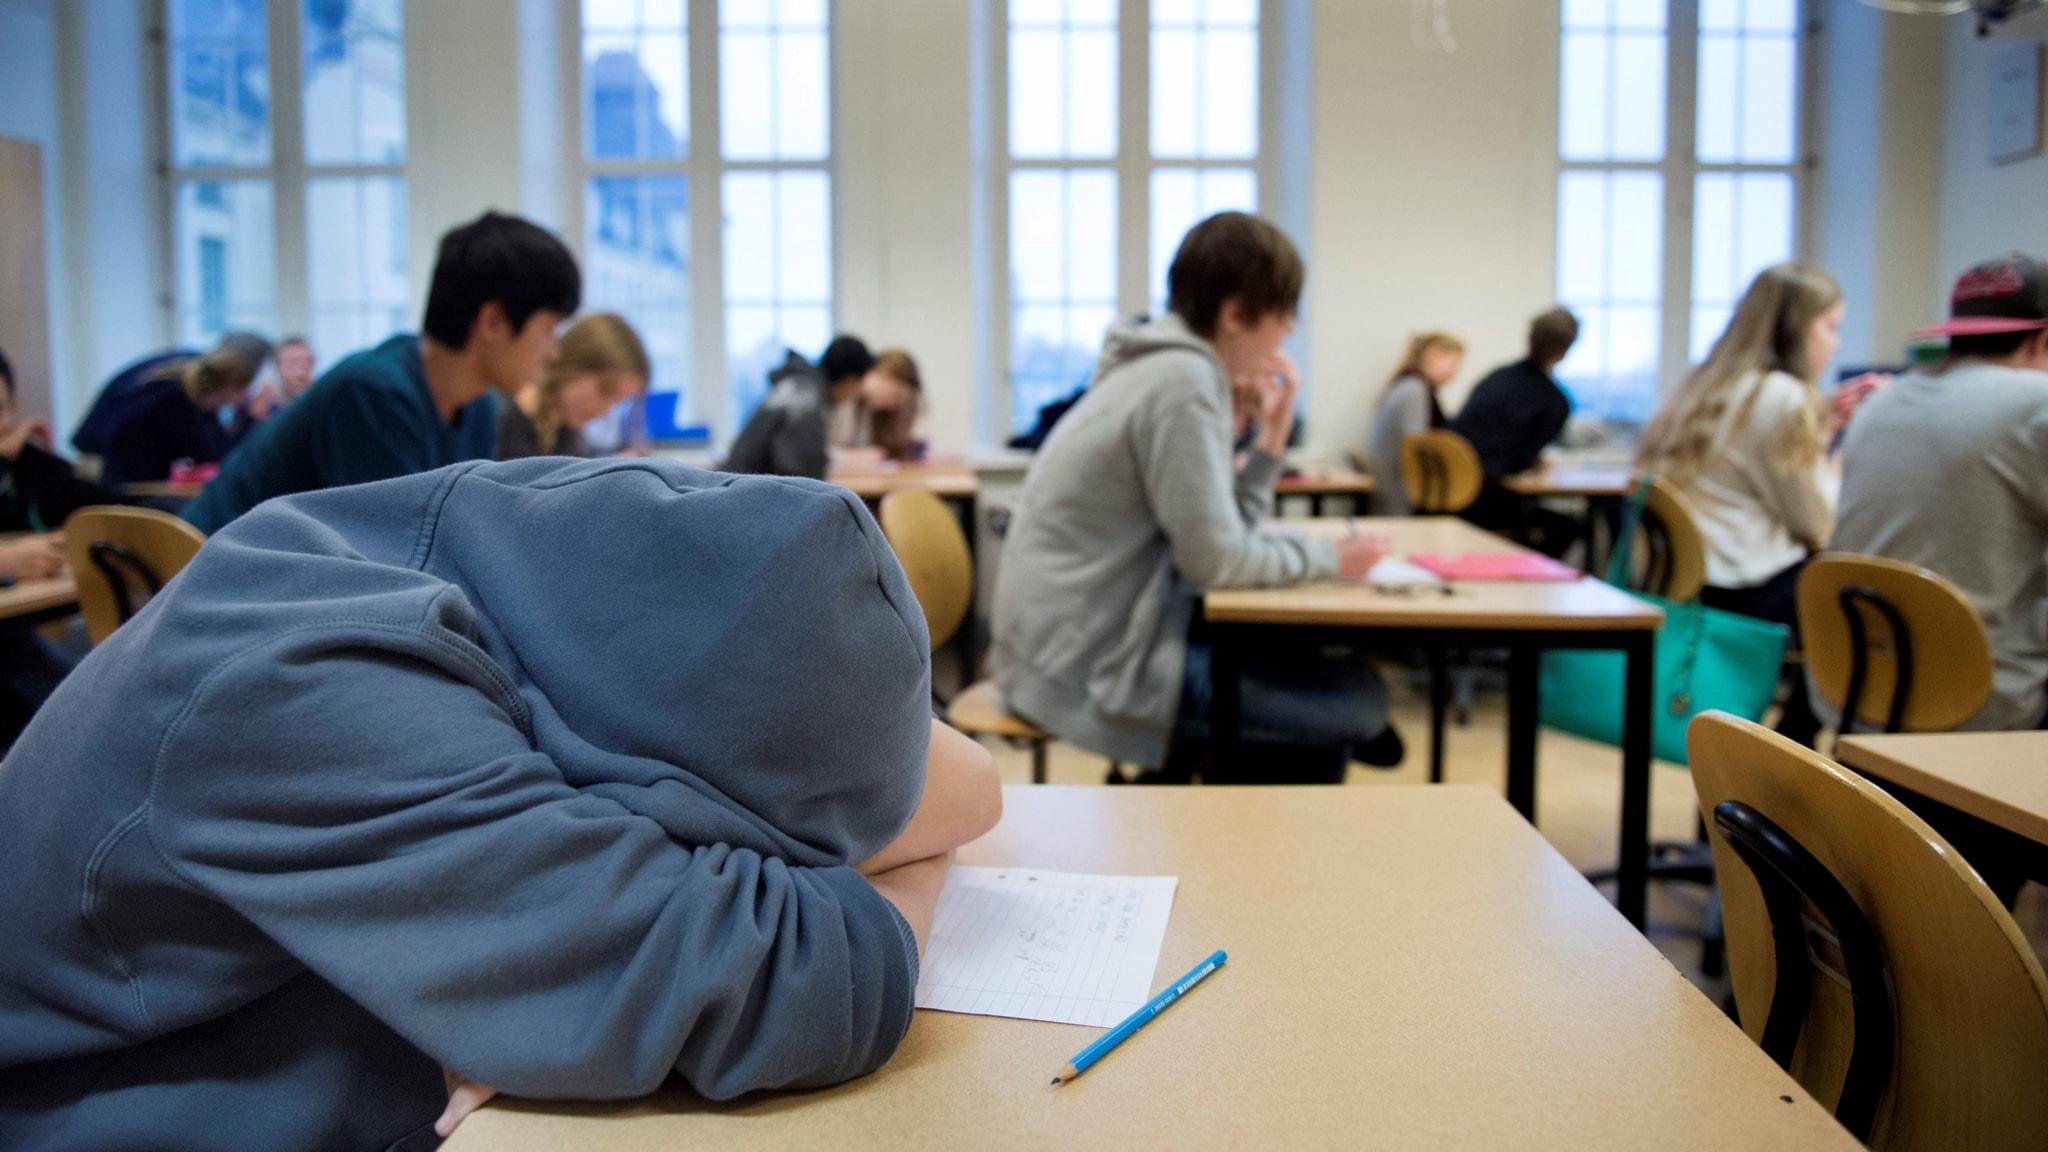 Jobbiga kompisar sabbar lugnet i klassrummet